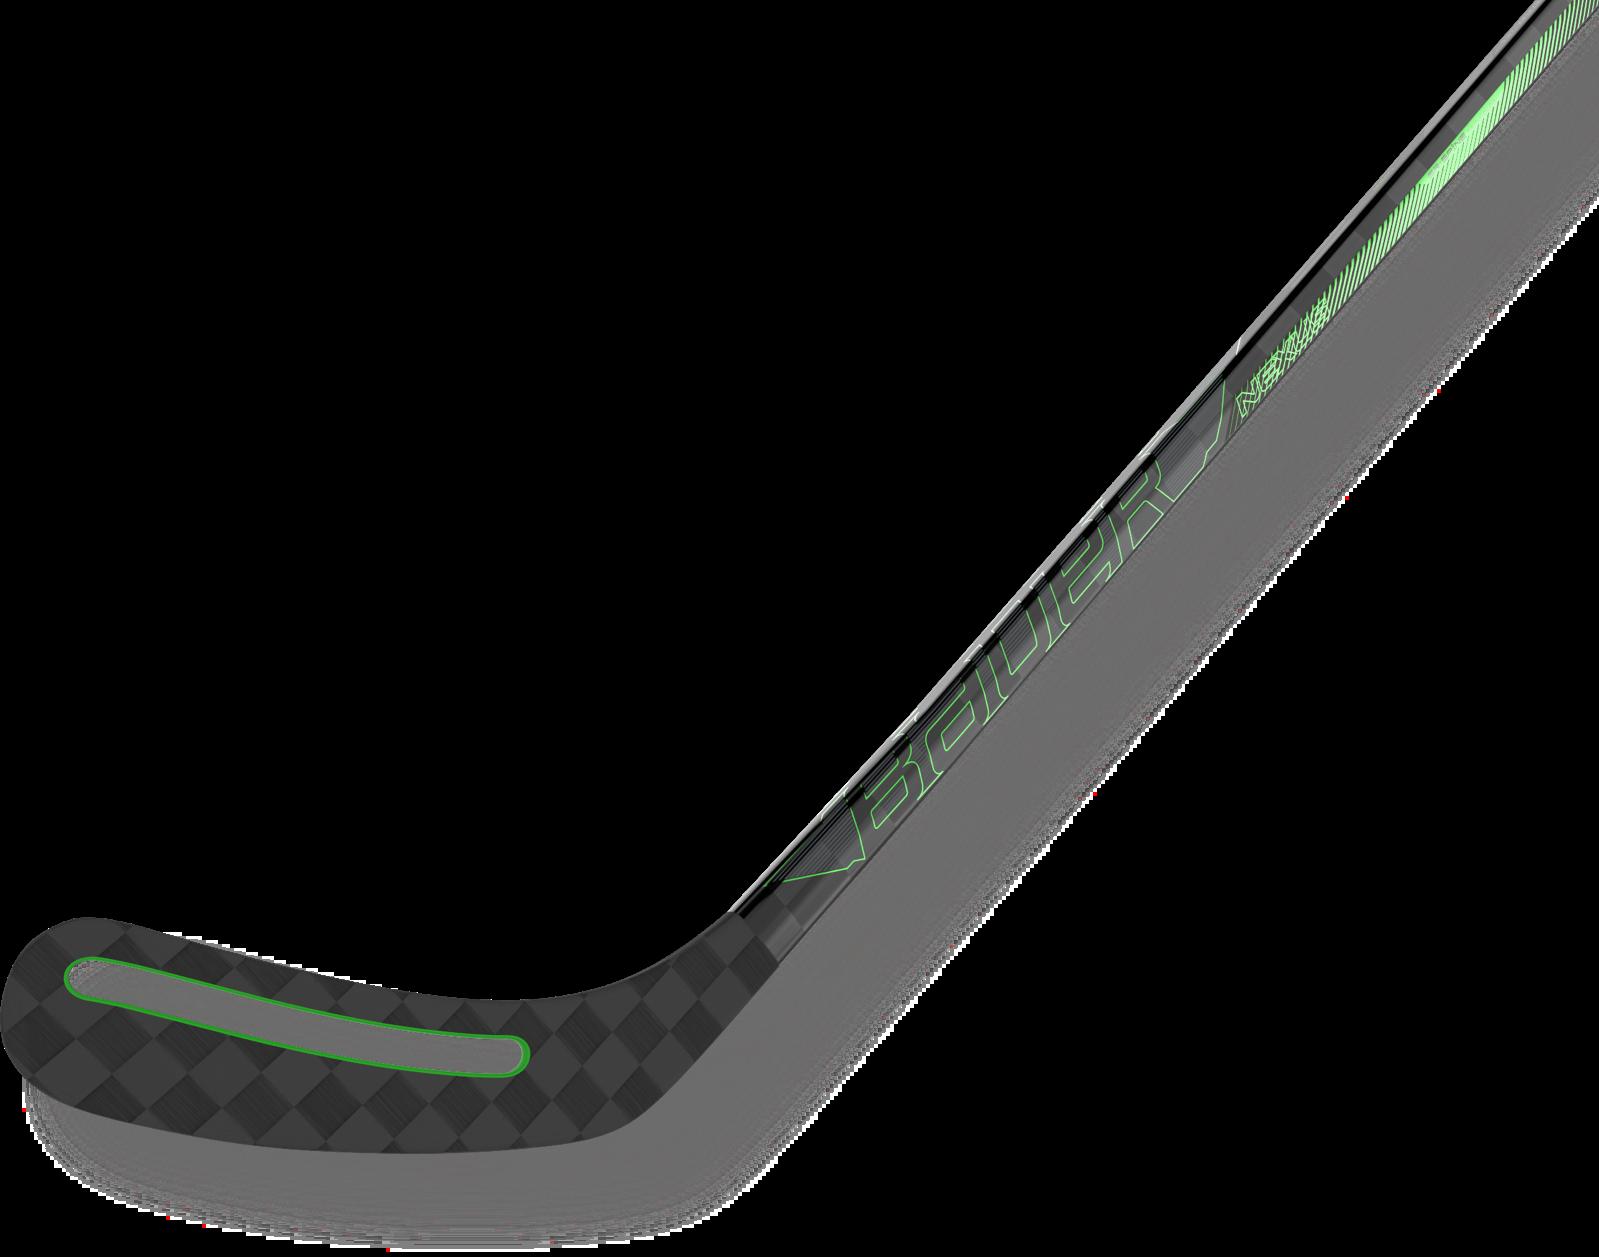 Nexus-Adv-TopBanner-Stick-3x